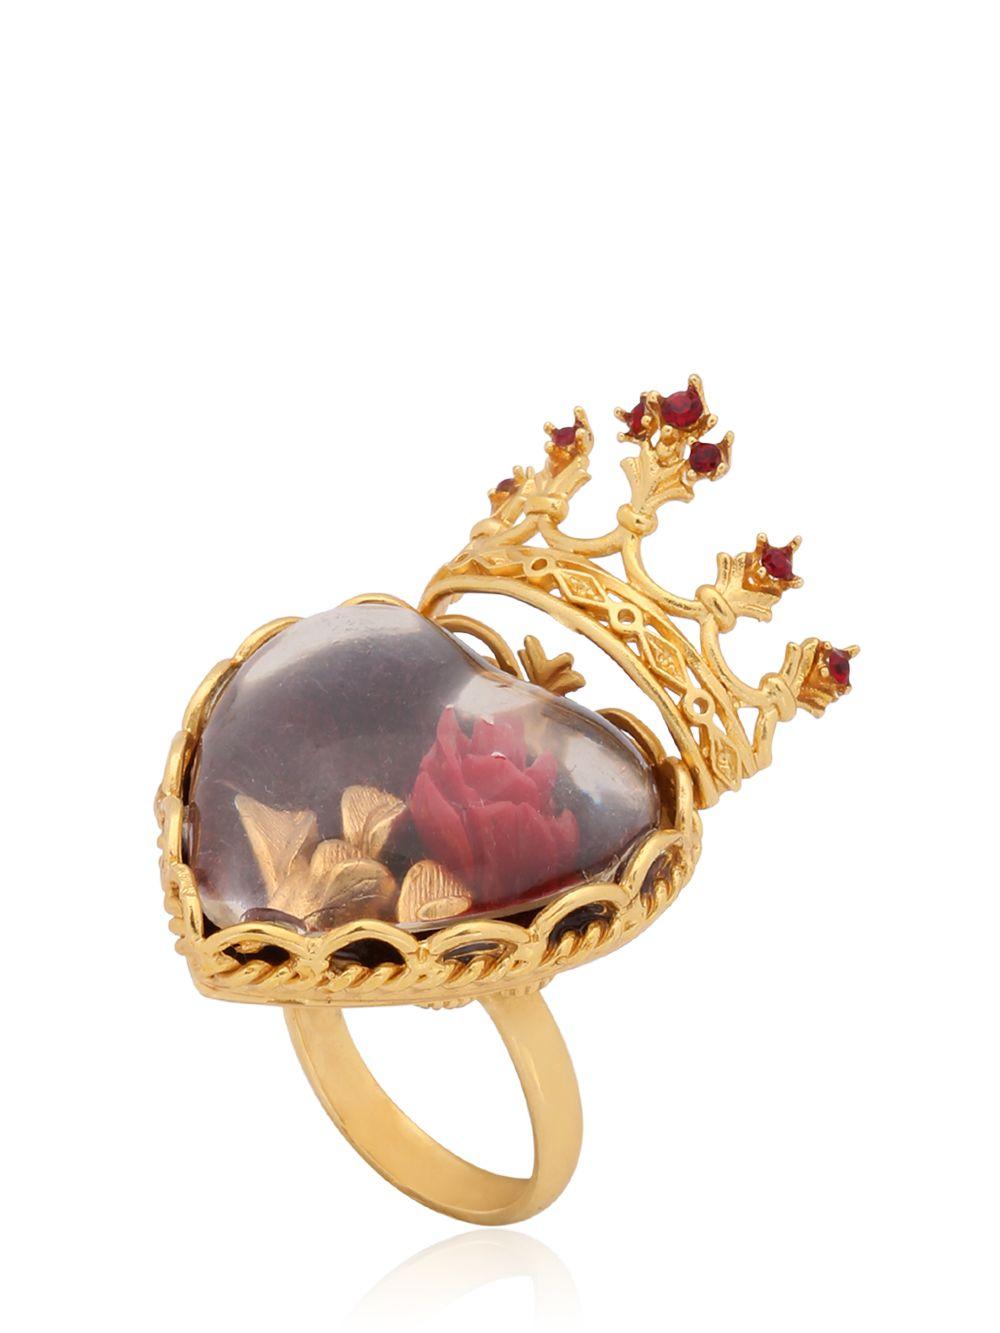 Dolce & Gabbana Sacred Heart Ring In Gold  Lyst. Model Wedding Rings. Morganite Engagement Rings. 24k Engagement Rings. Jacqueline Kennedy's Wedding Rings. David Yurman Rings. Beachy Wedding Rings. Multiple Engagement Rings. Asifa Wedding Rings